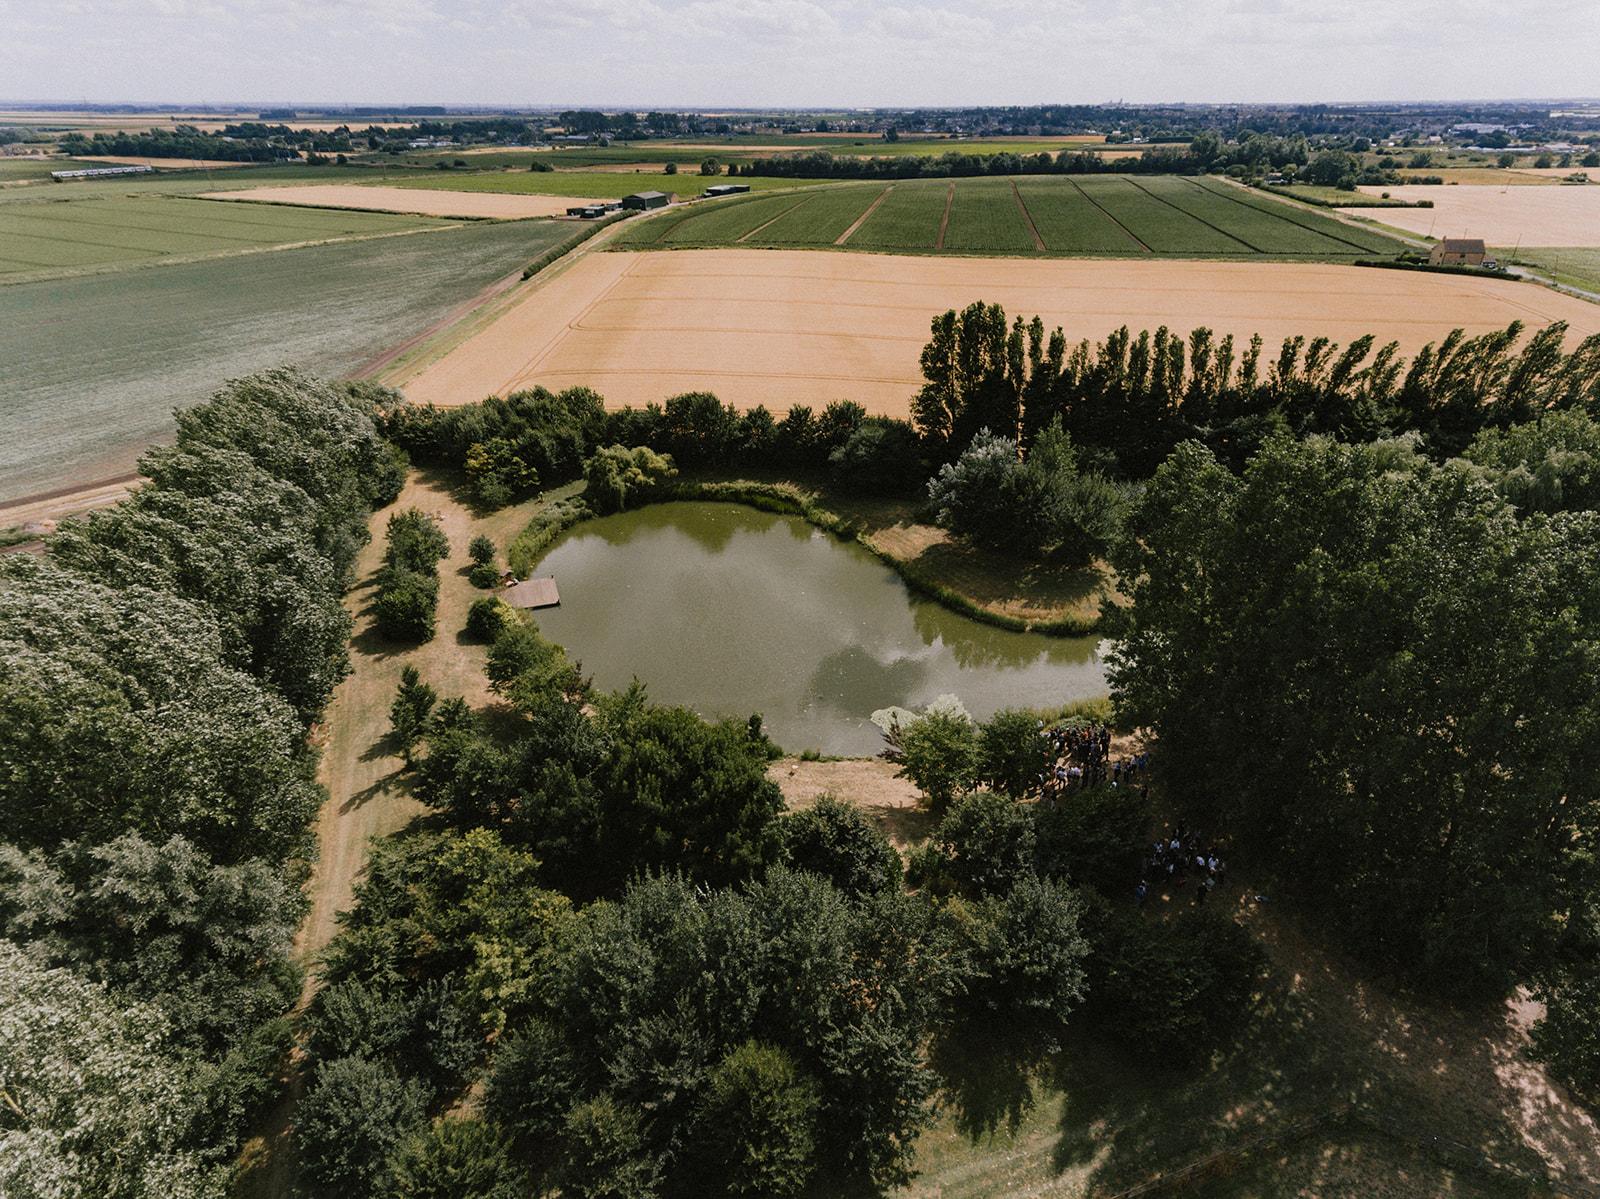 Aerial view of wedding lake